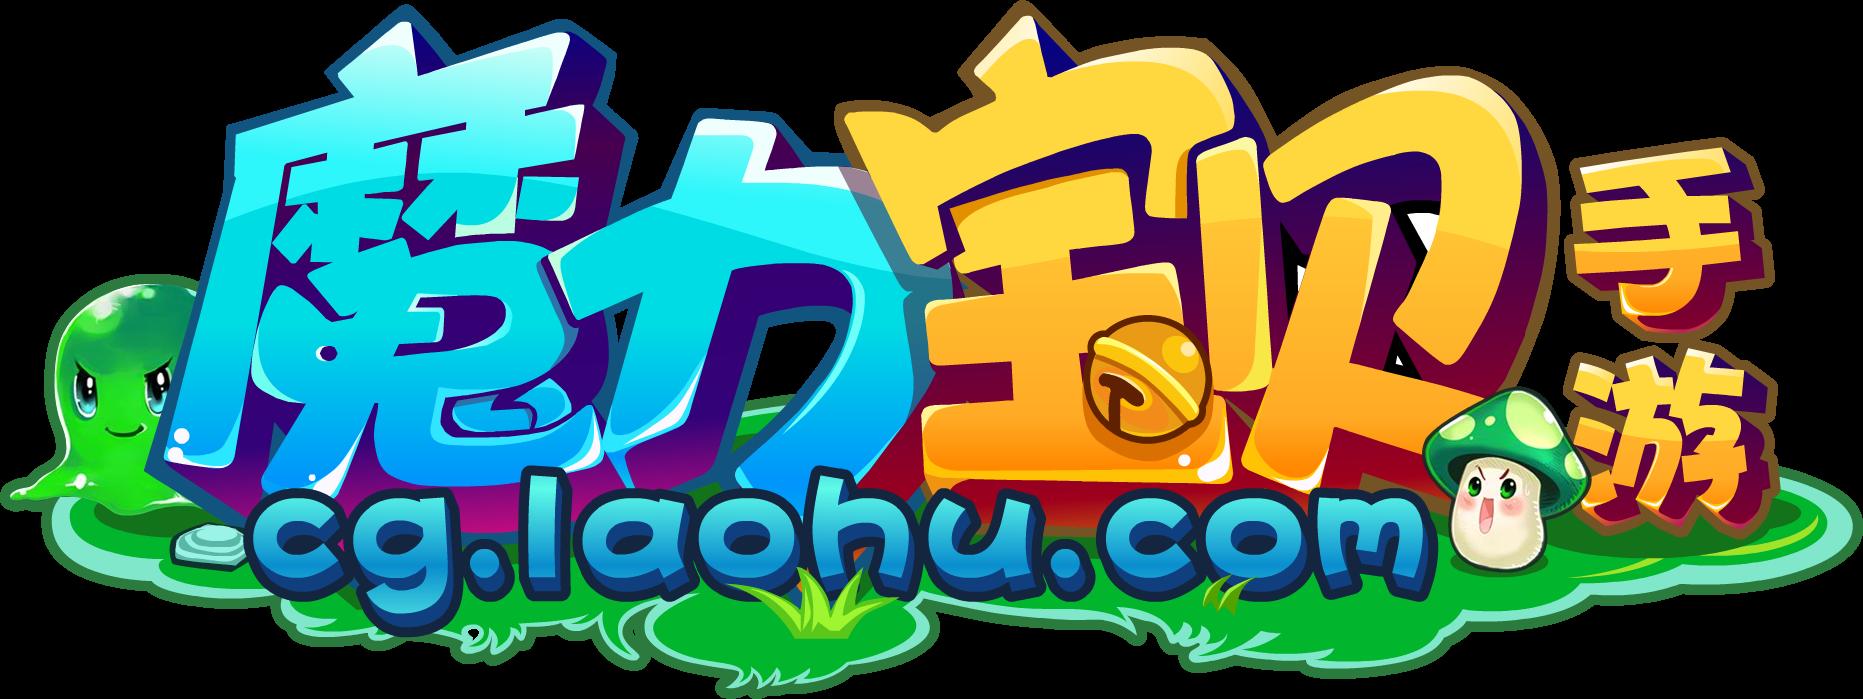 魔力宝贝新logo.png